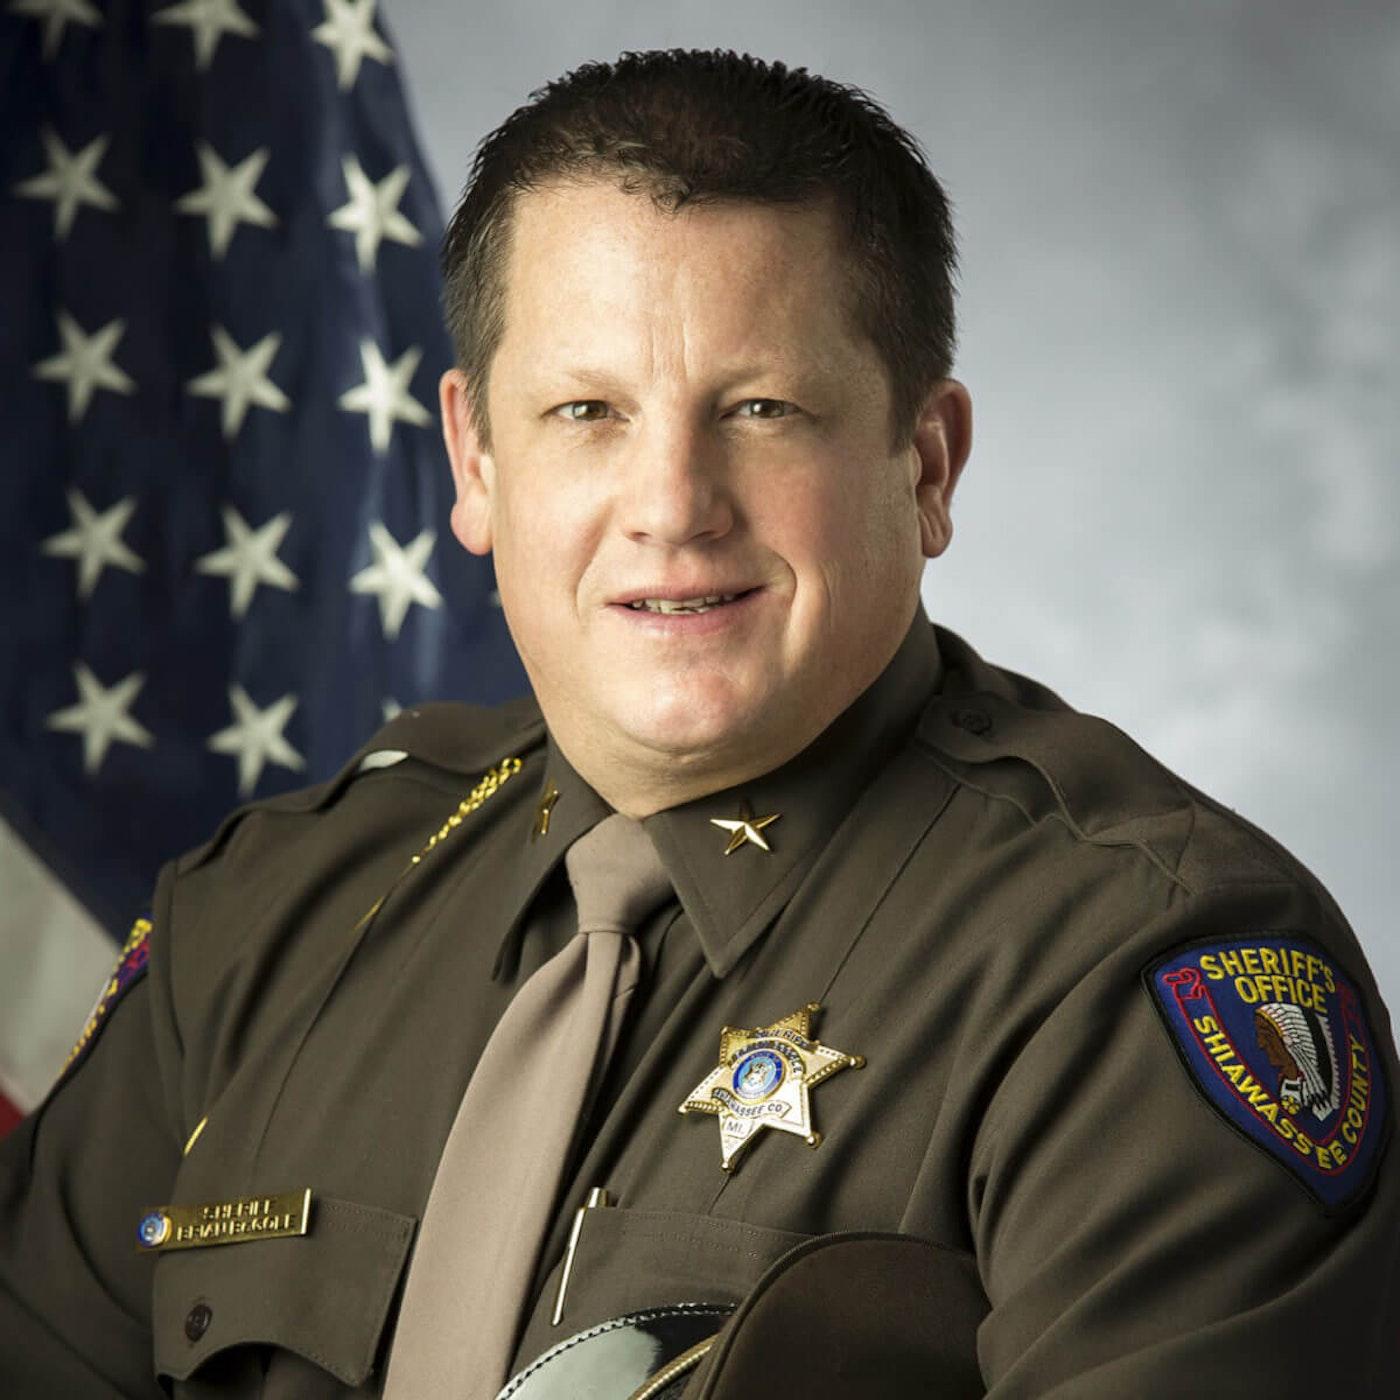 Sheriff Brian BeGole. Photo courtesy the Michigan Sheriffs Association.